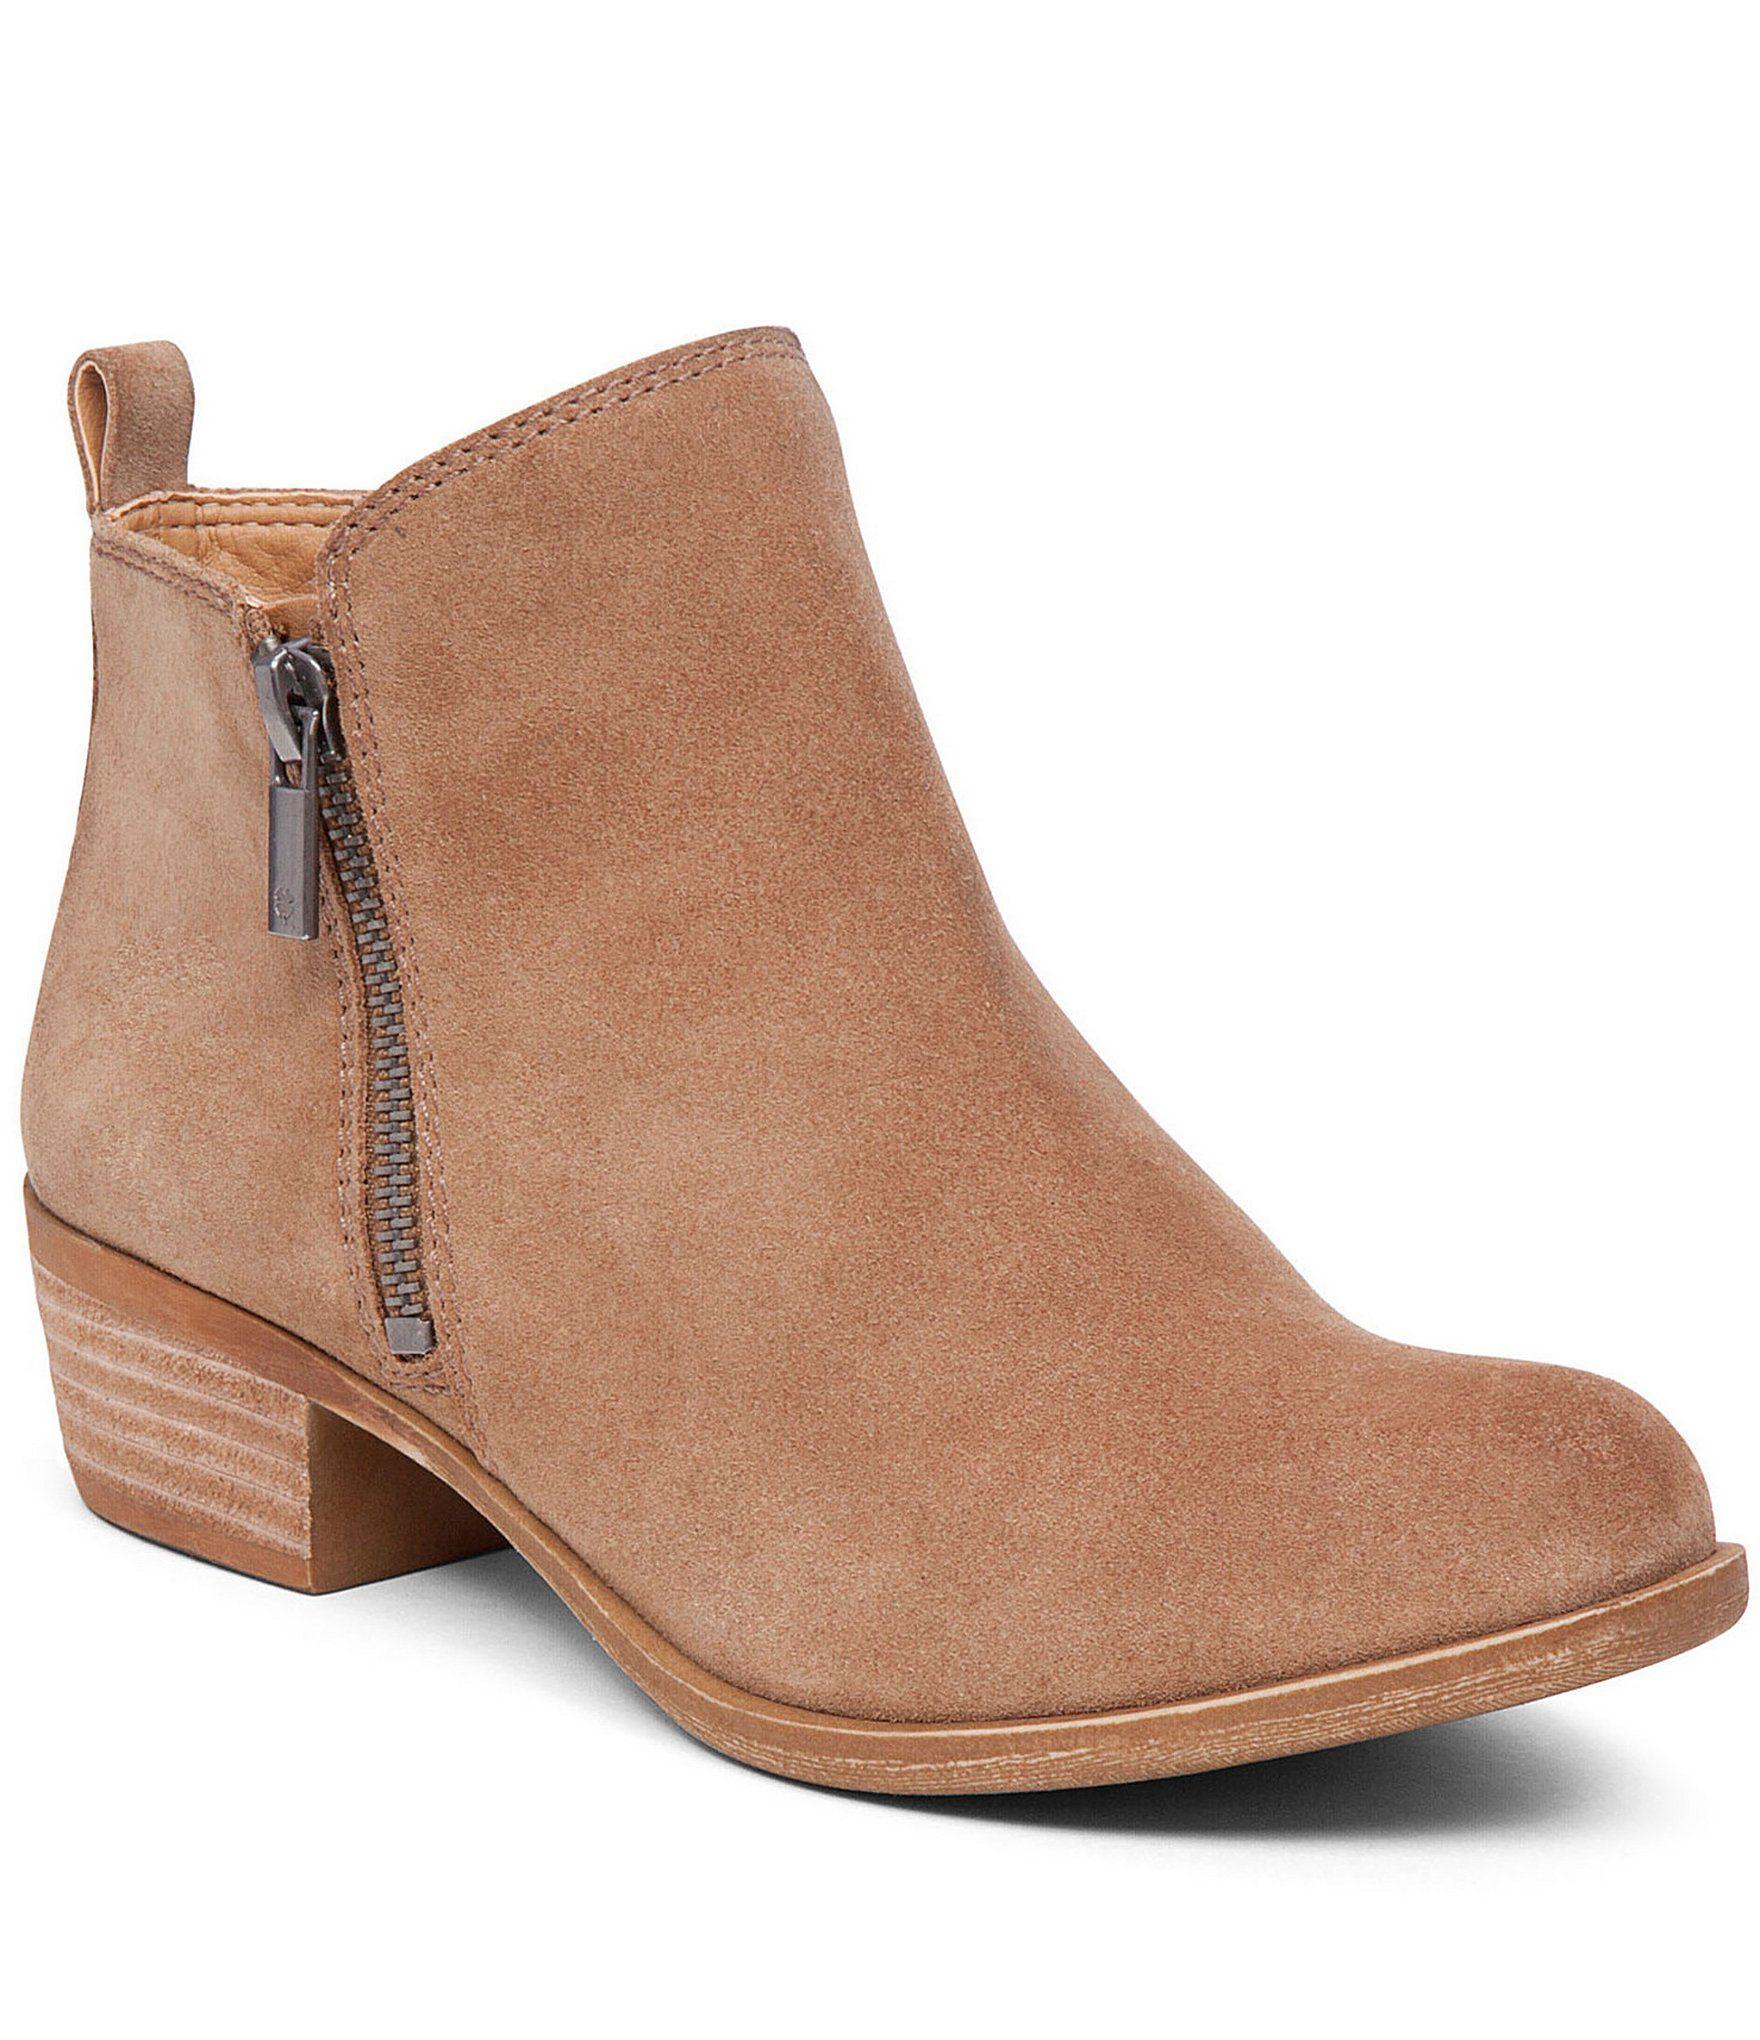 1c7b42721337 Kensie Ladies  Short Heel Suede Bootie